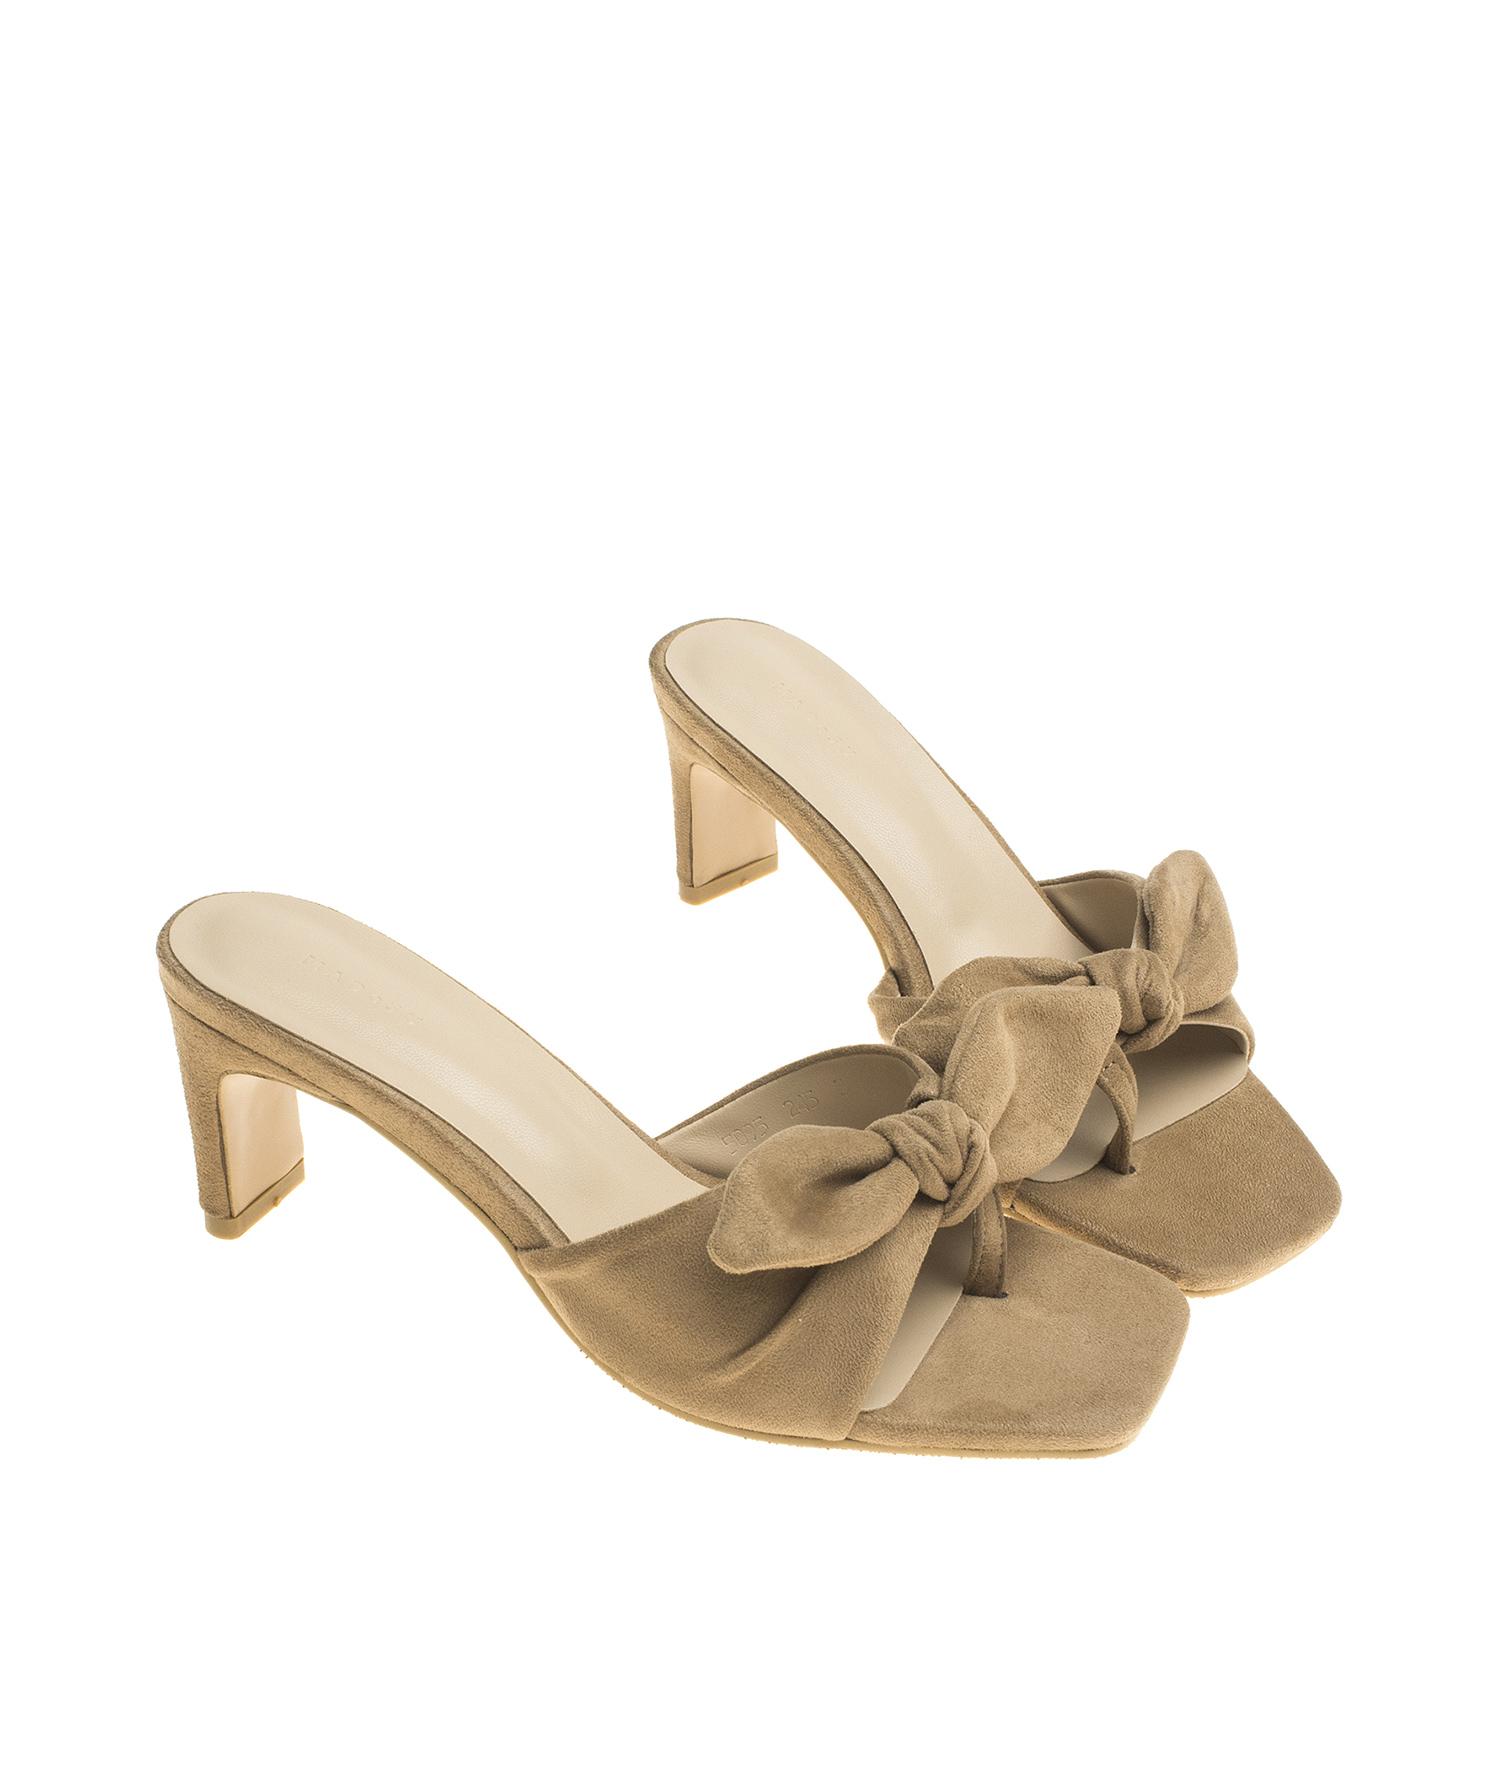 c535623e6b85 AnnaKastle Womens Bow Knot Toe Ring Mule Sandals Beige